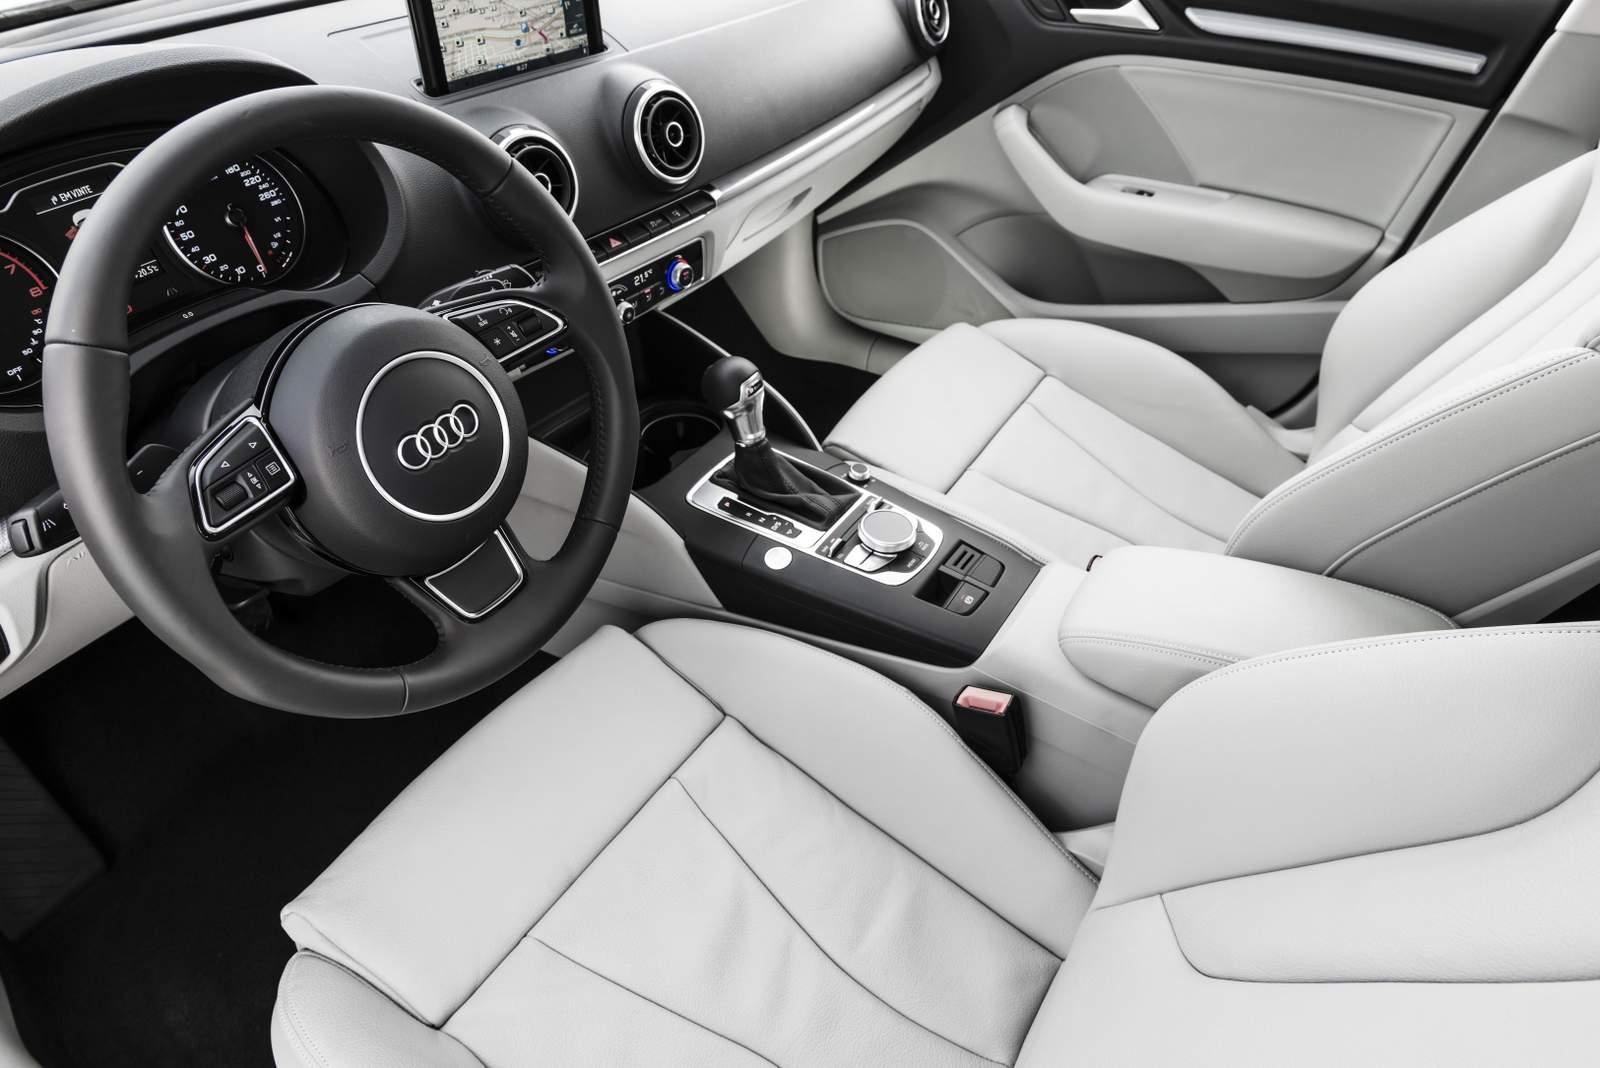 Audi A3 Sedan 2.0 Ambition - interior